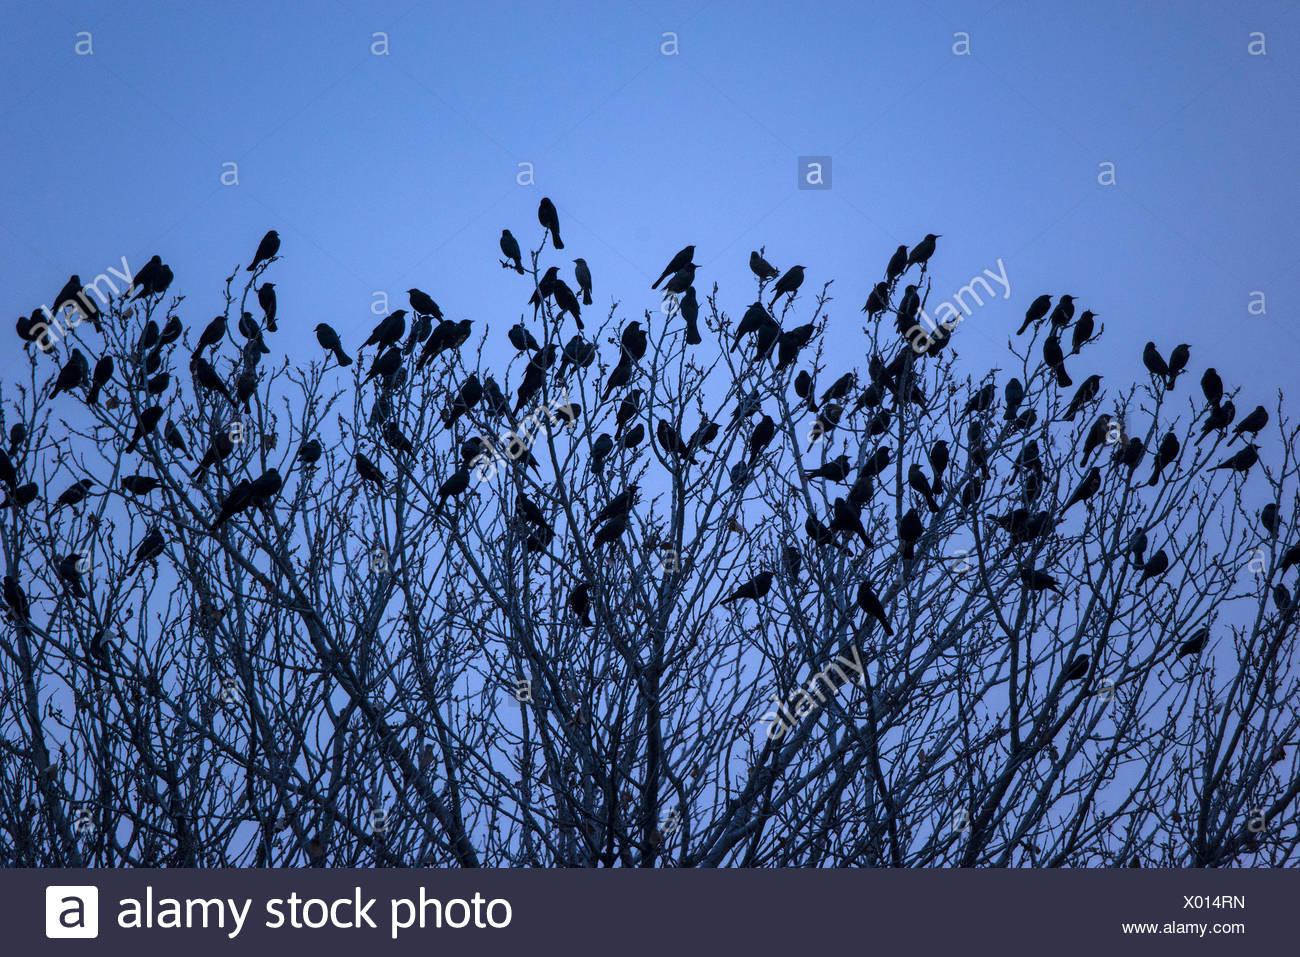 blackbirds, tree, treetop, bird - Stock Image